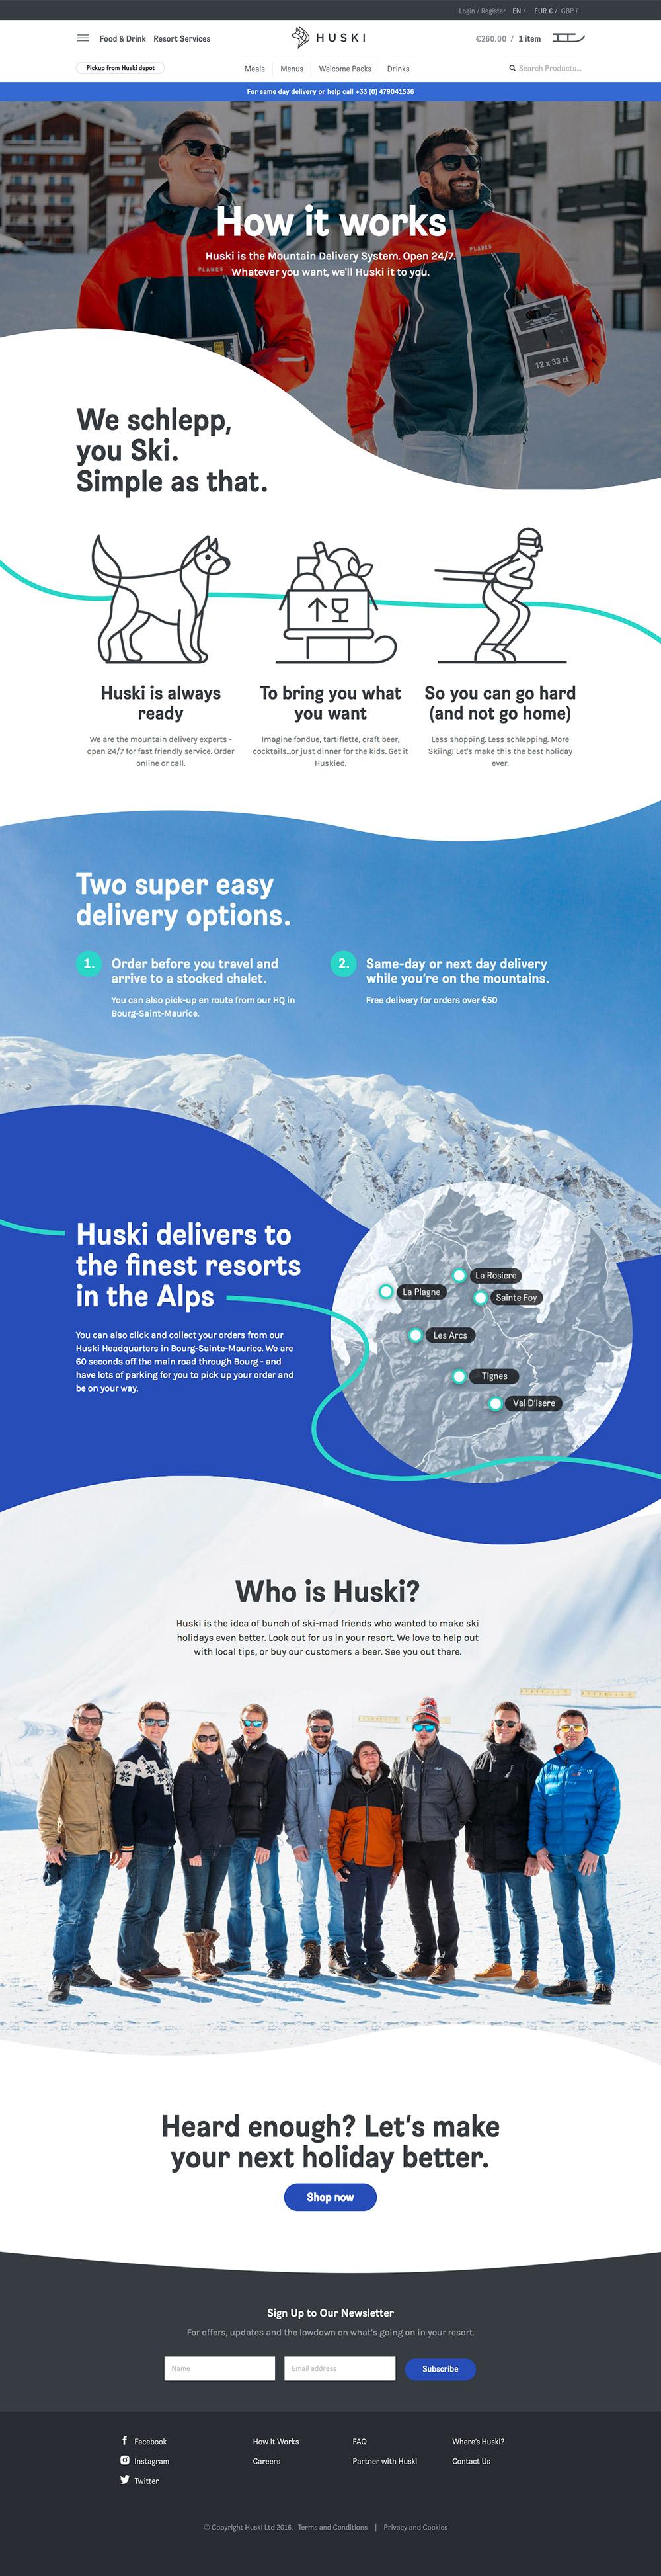 huski-website-about.jpg